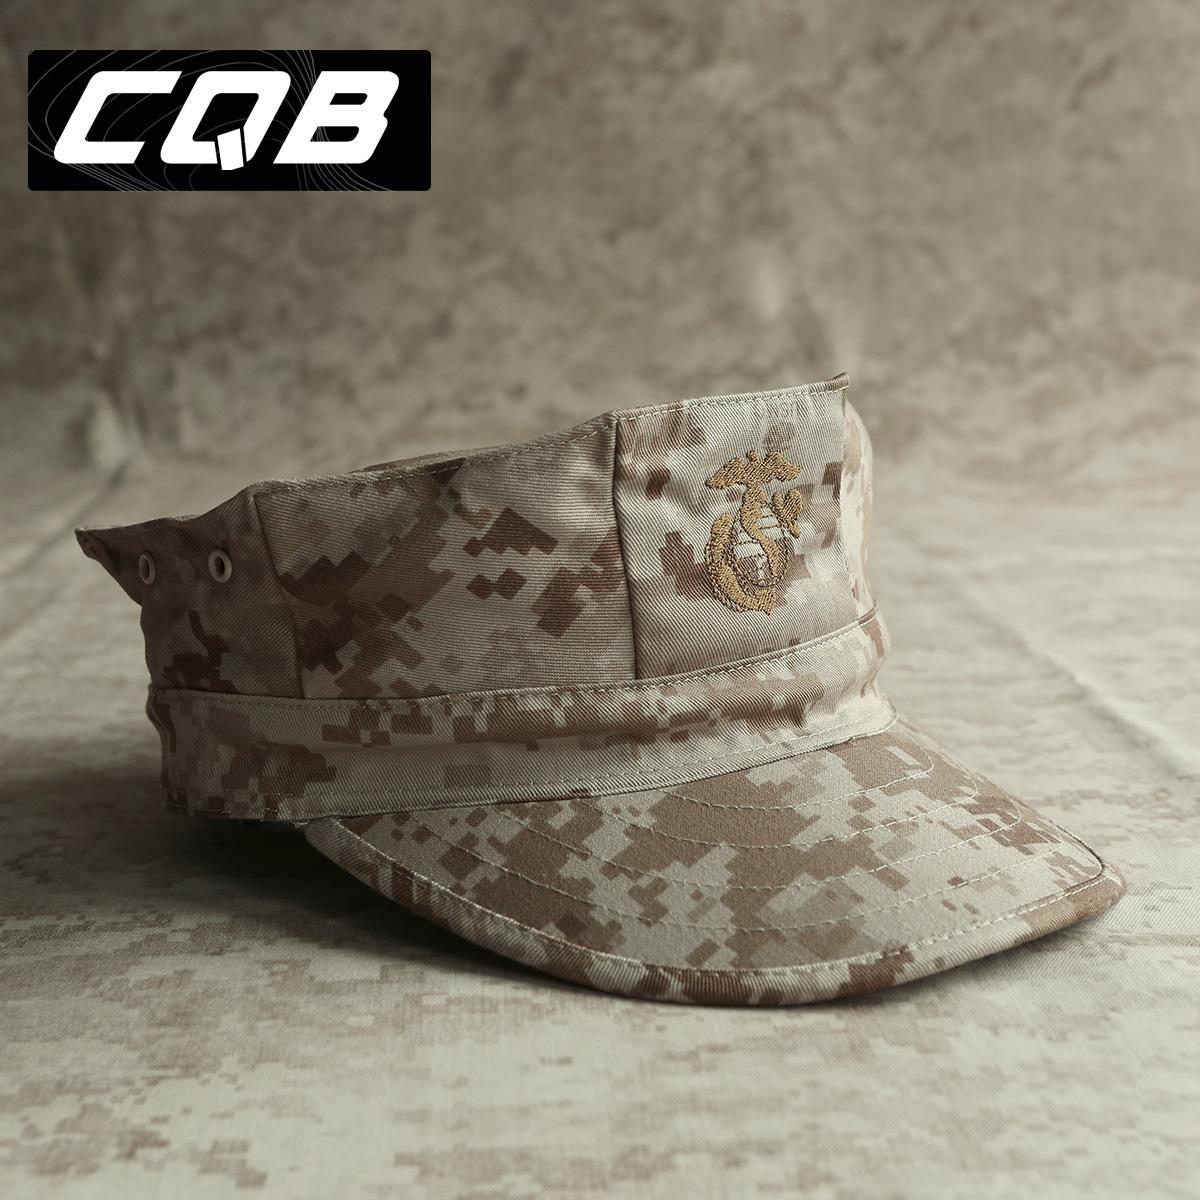 CQB 陆战队八角帽 迷彩帽  男 战术帽 丛林 沙数 遮阳帽子